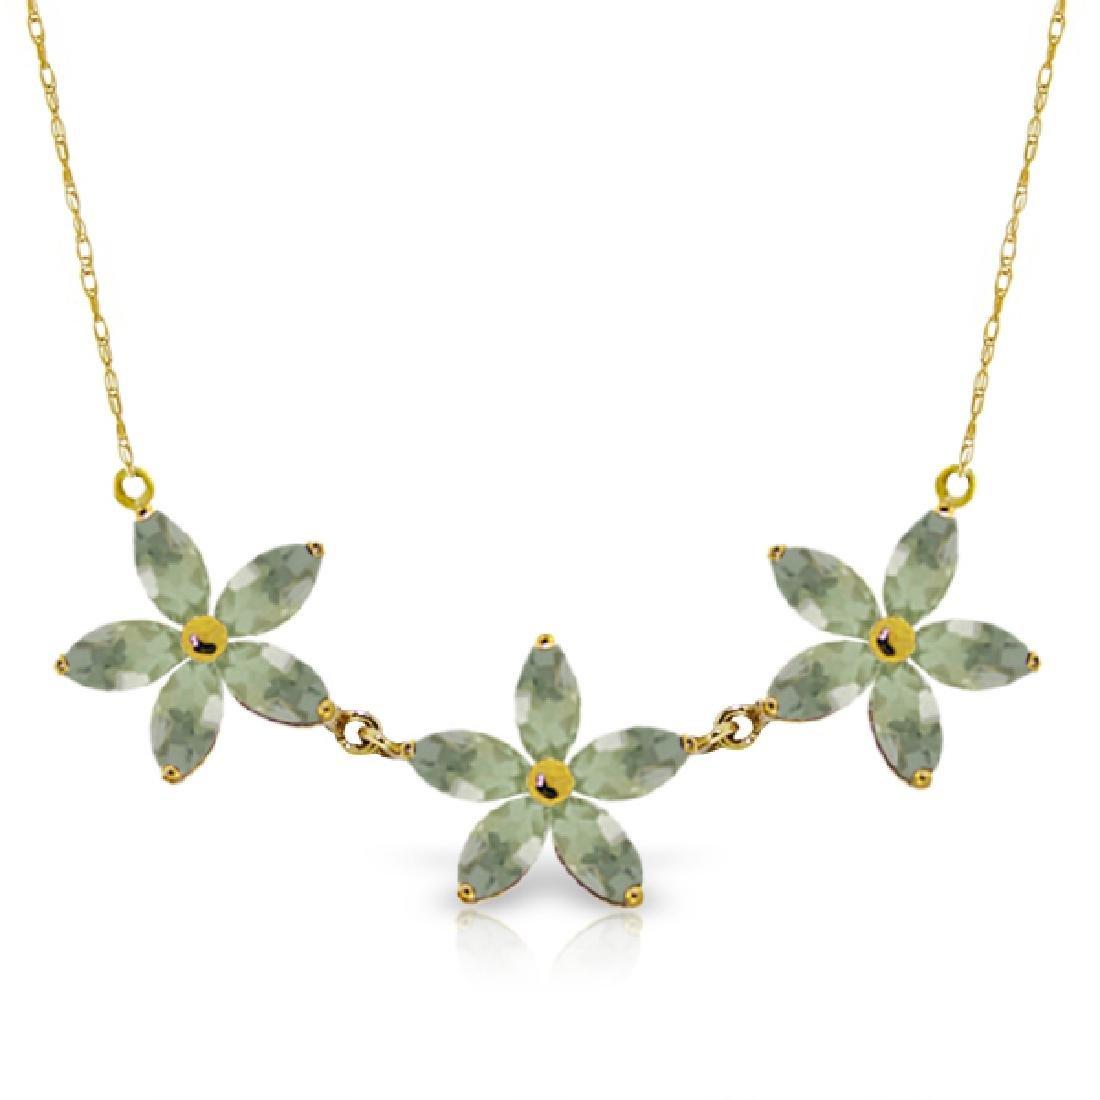 Genuine 4.2 ctw Green Amethyst Necklace Jewelry 14KT